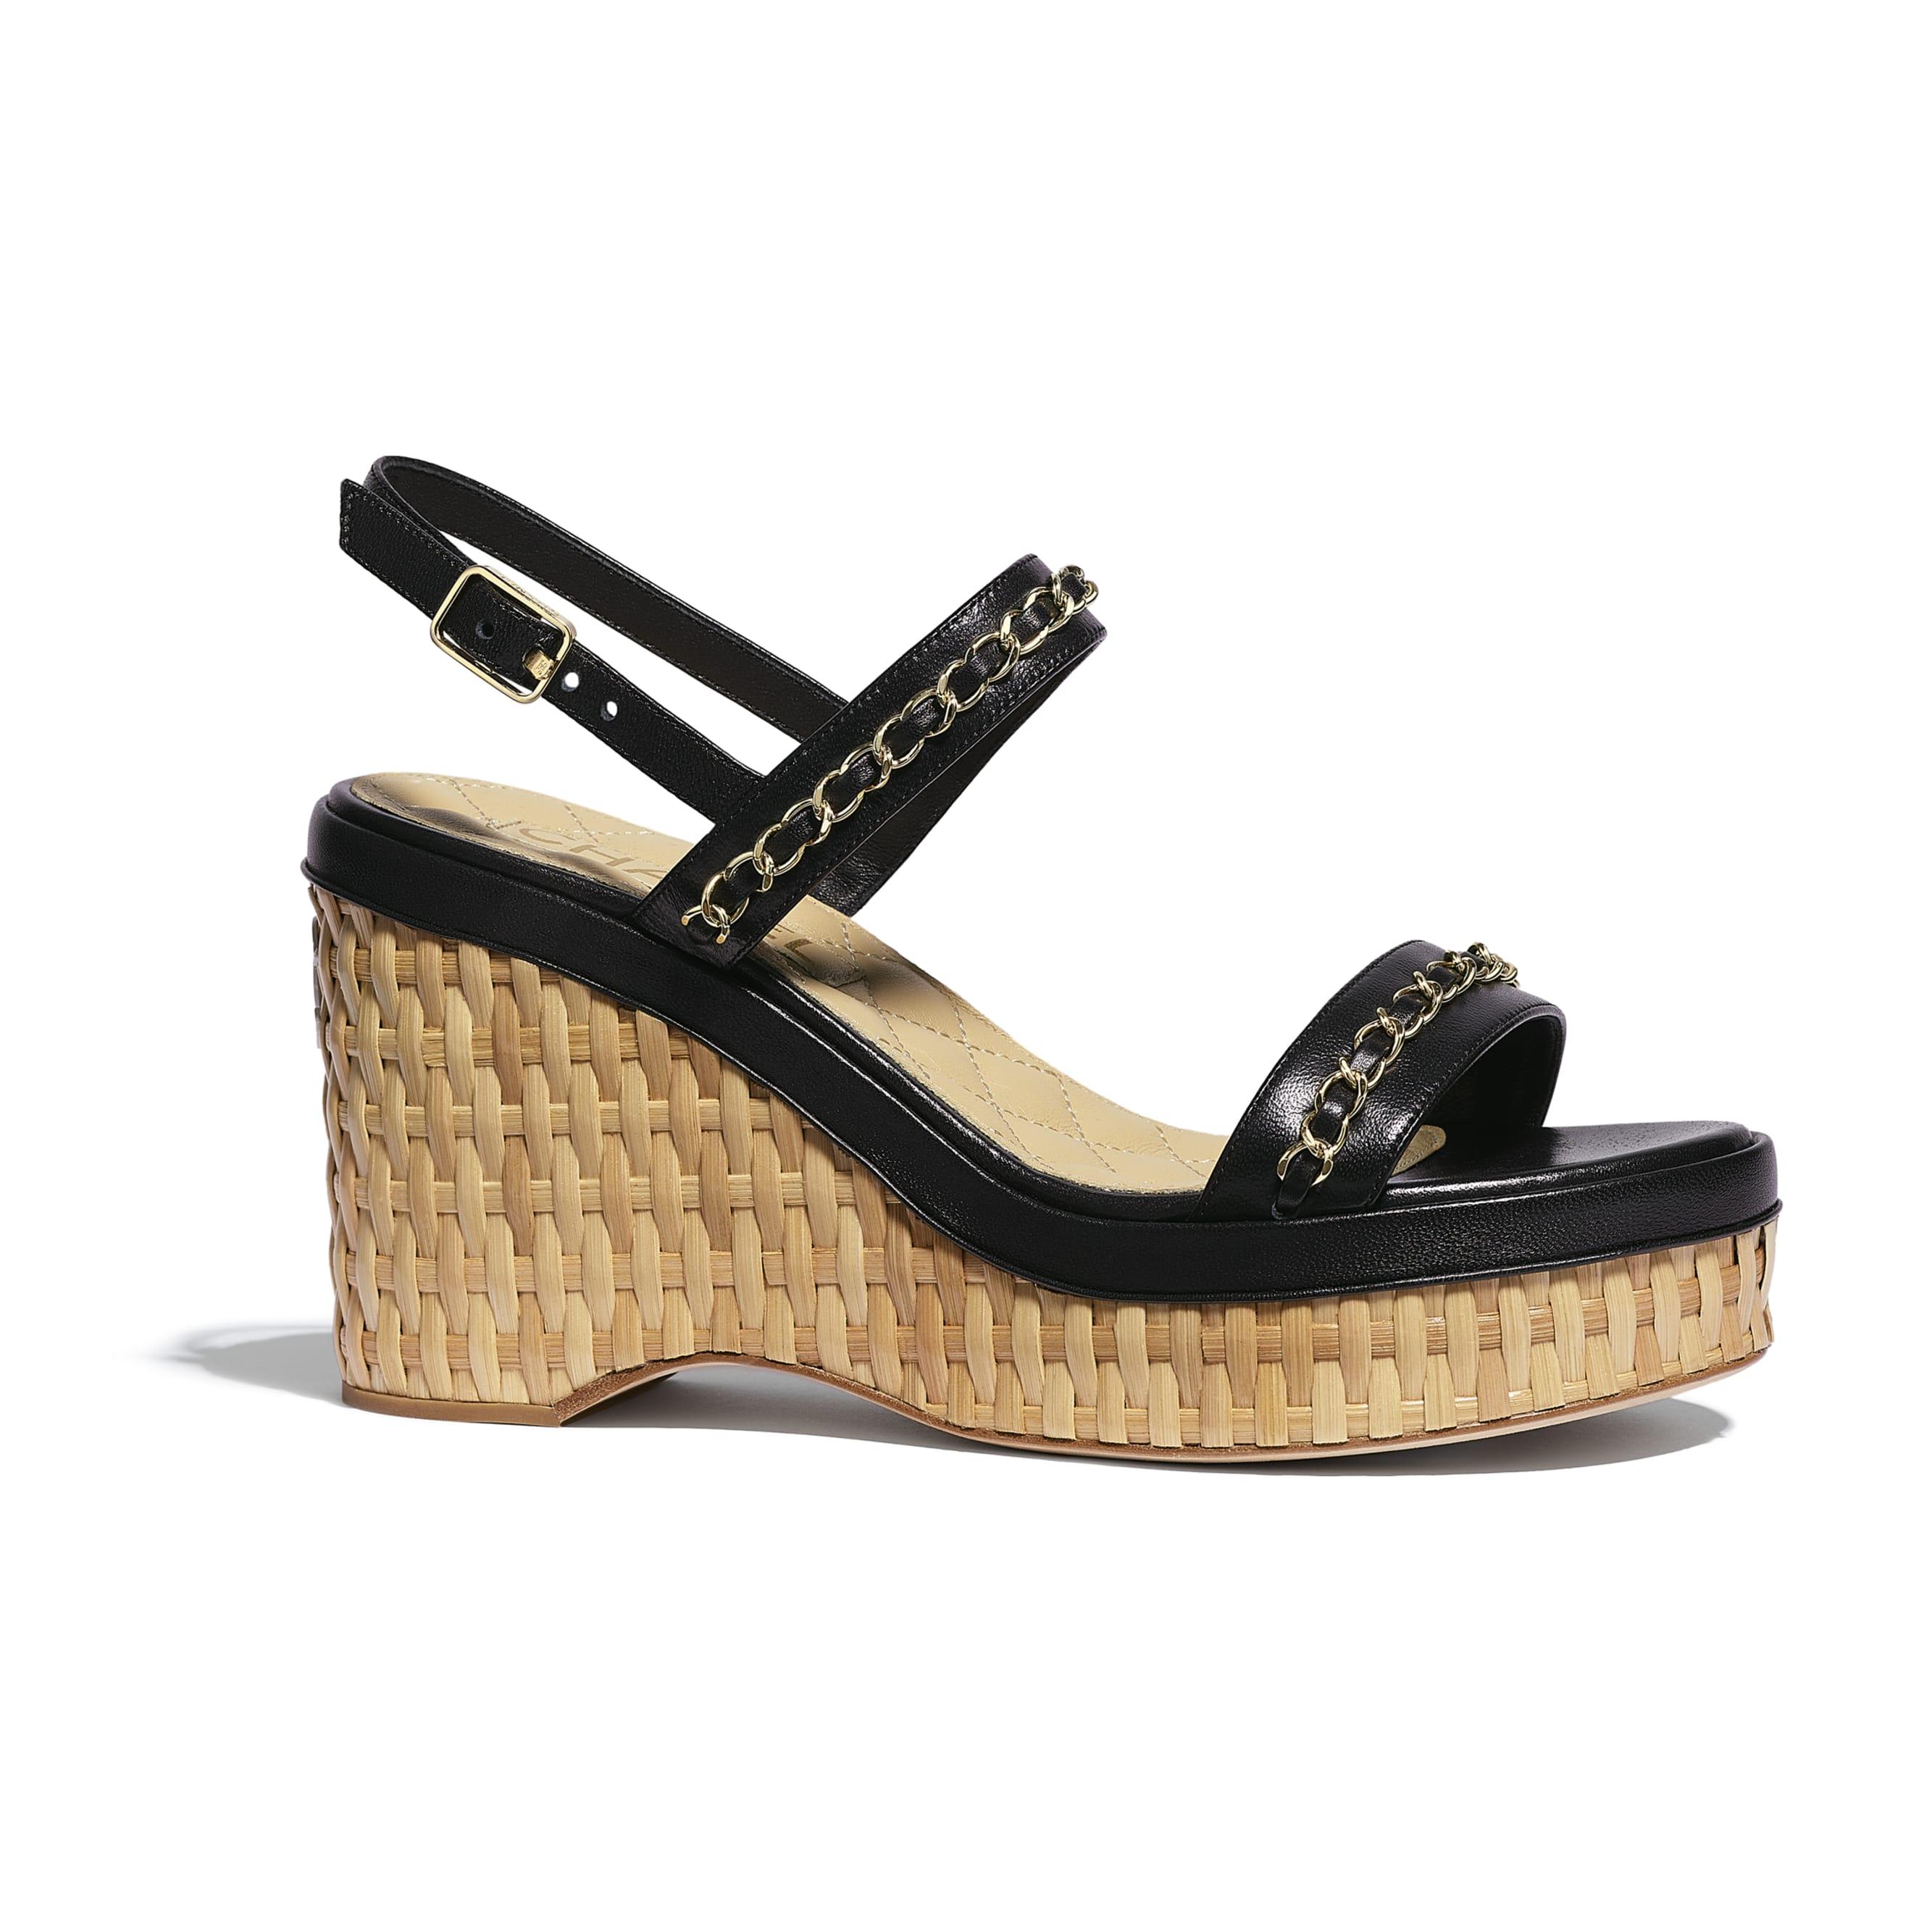 Sandals - Black - Lambskin - CHANEL - Default view - see standard sized version